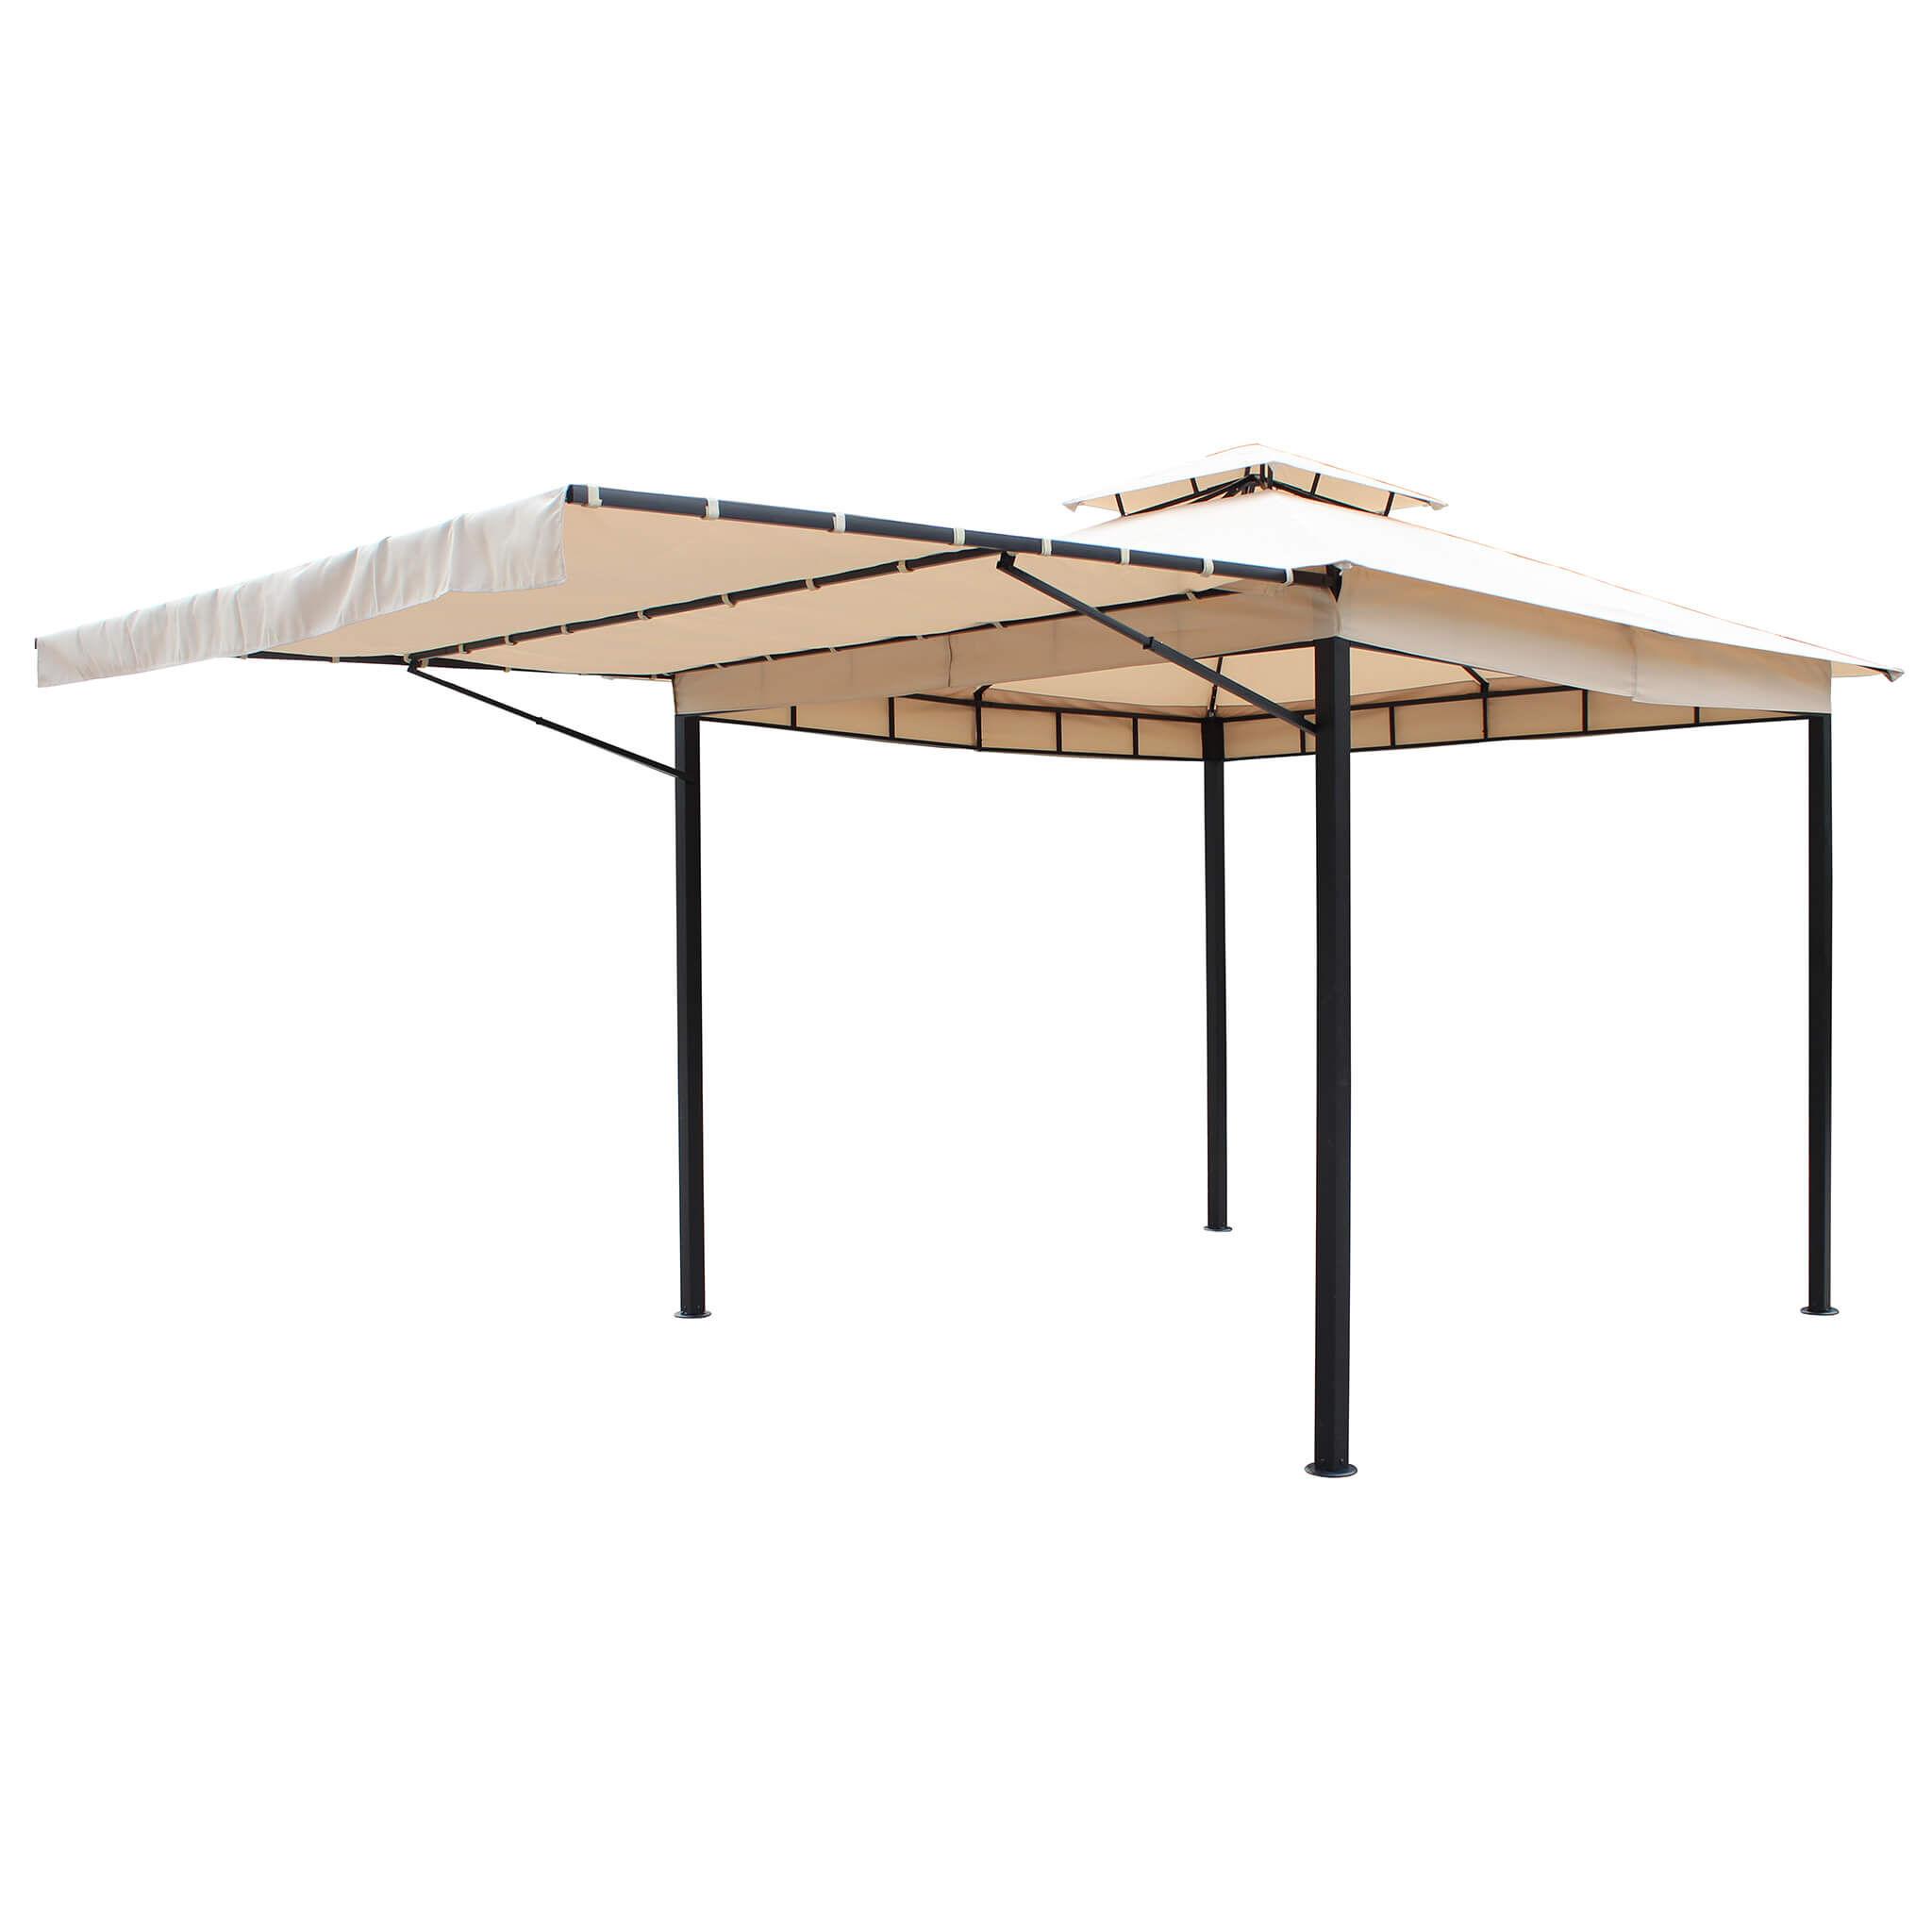 Milani Home ALEXANDER - gazebo da giardino 3,3 x 3,3 di tettoia apribile